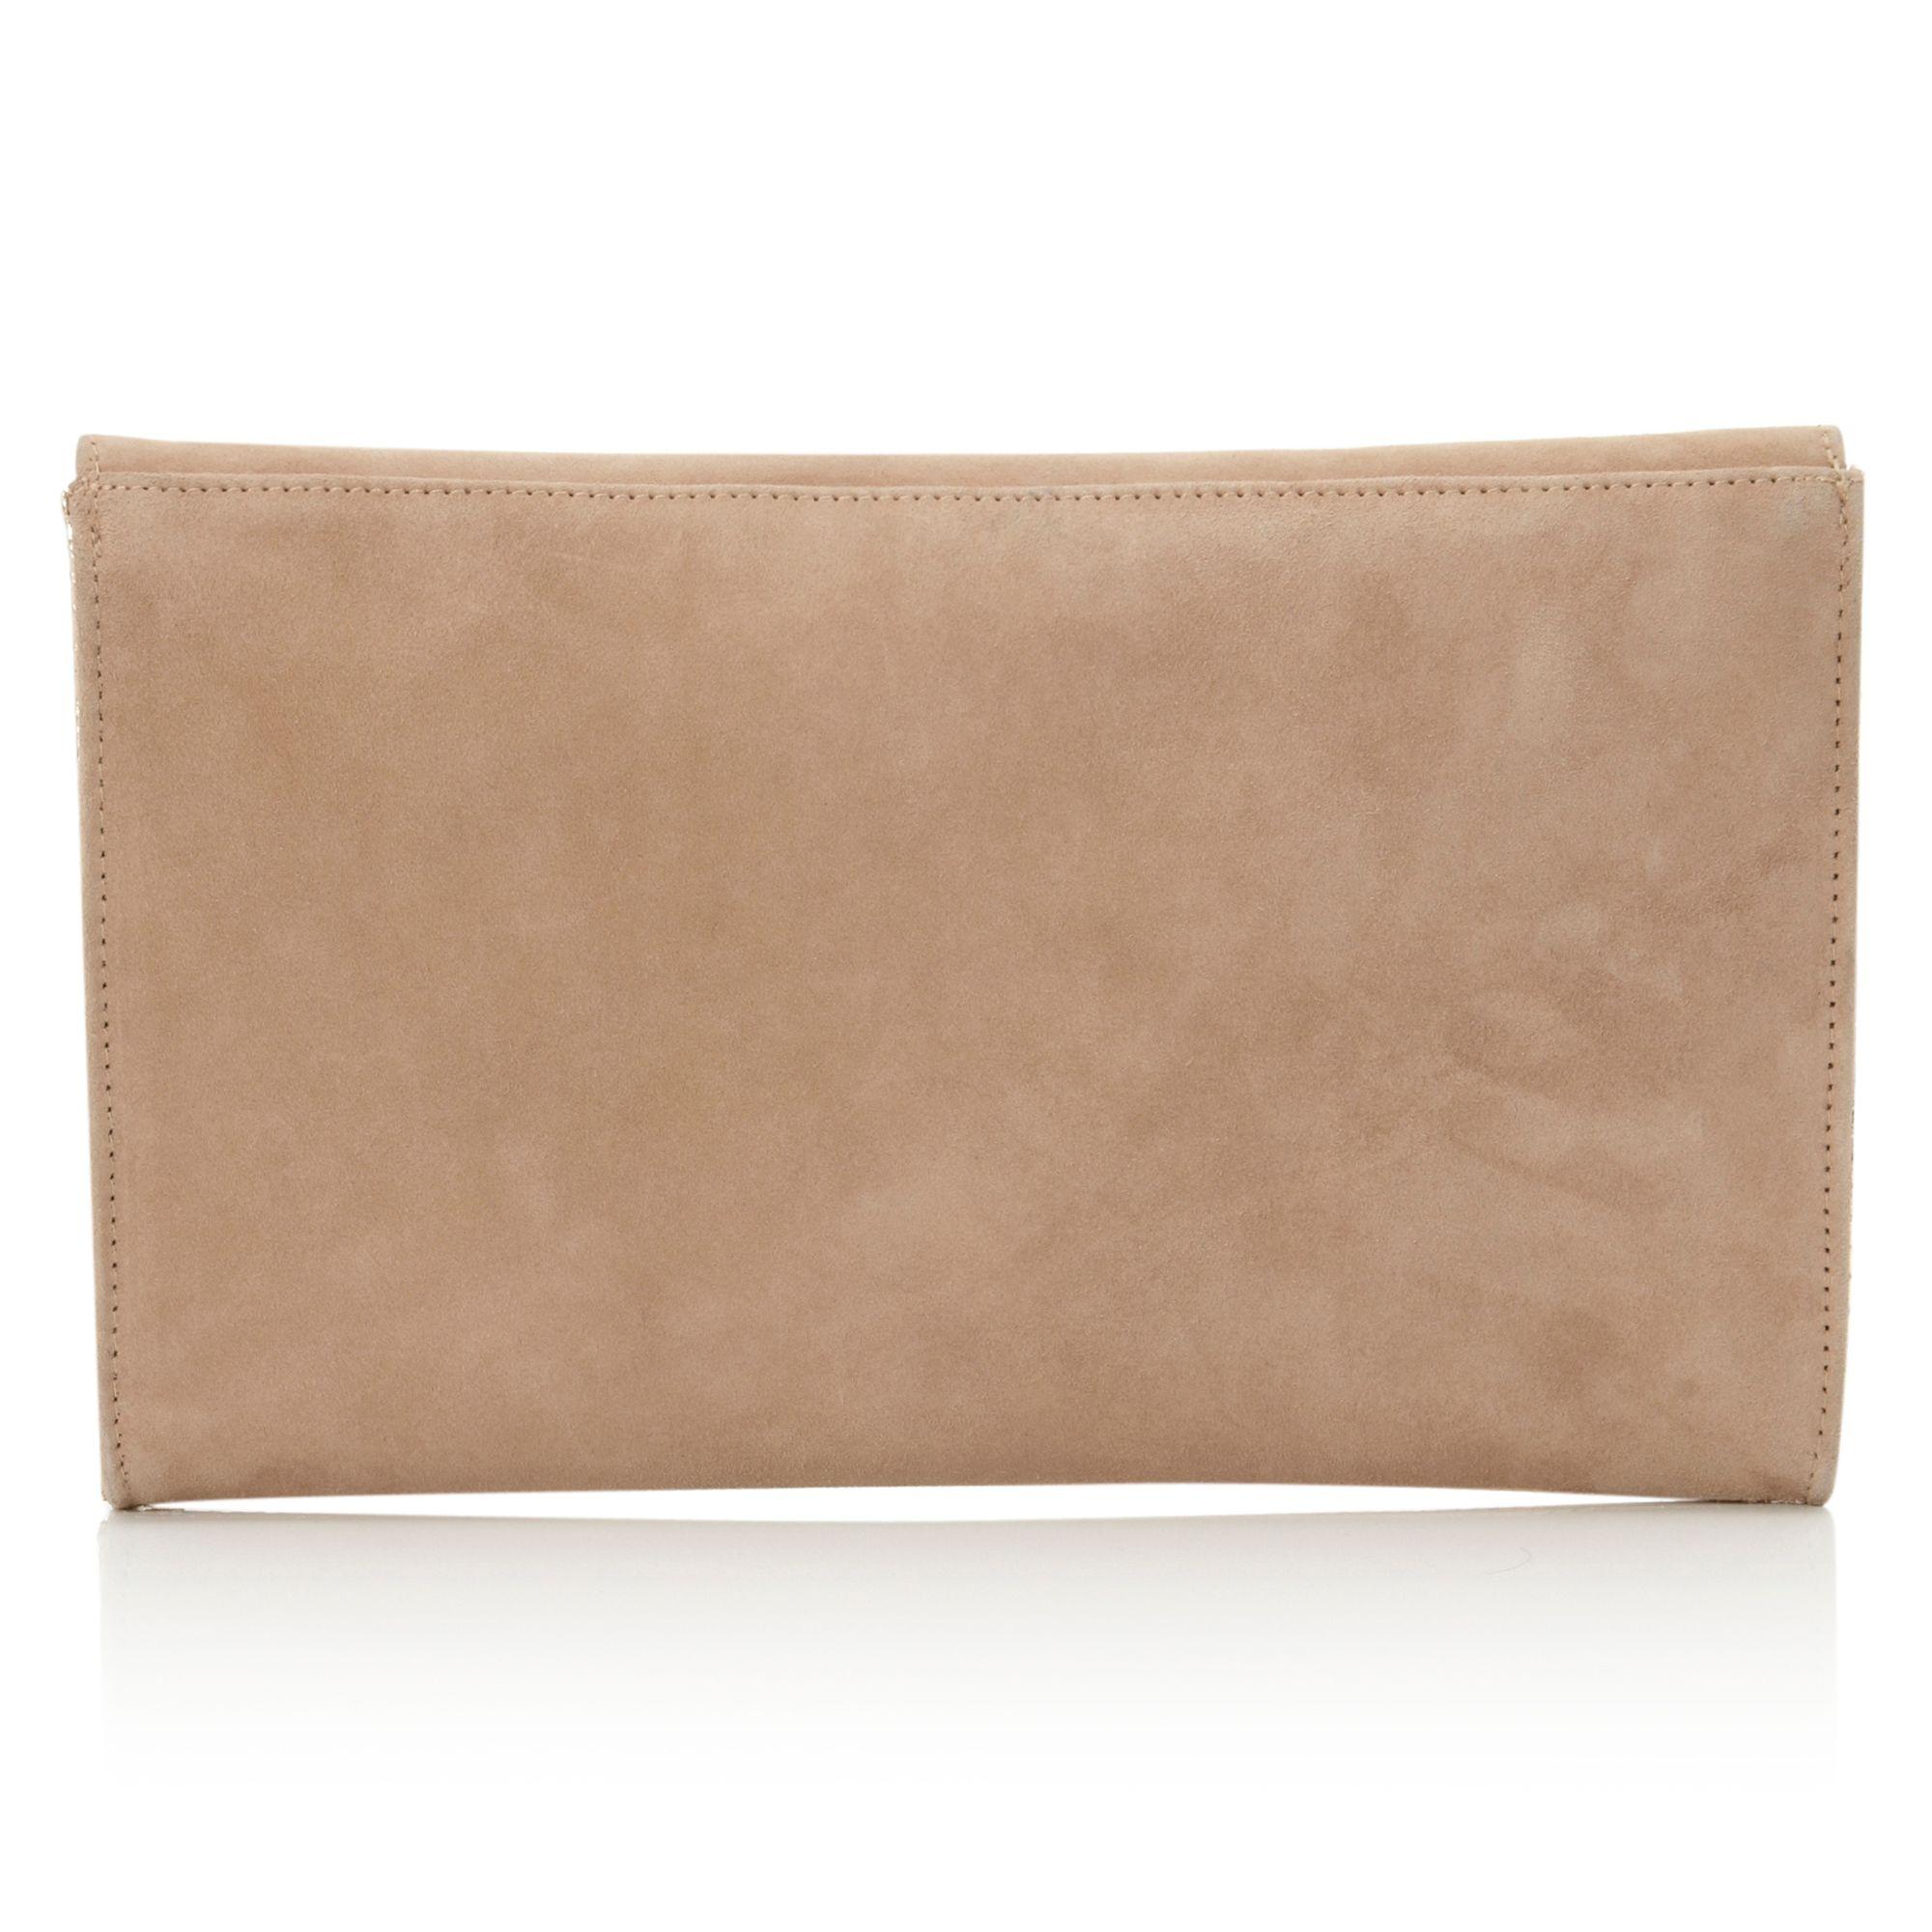 Dune elodie suede clutch bag : Dune bacco suede and metallic clutch bag in brown lyst